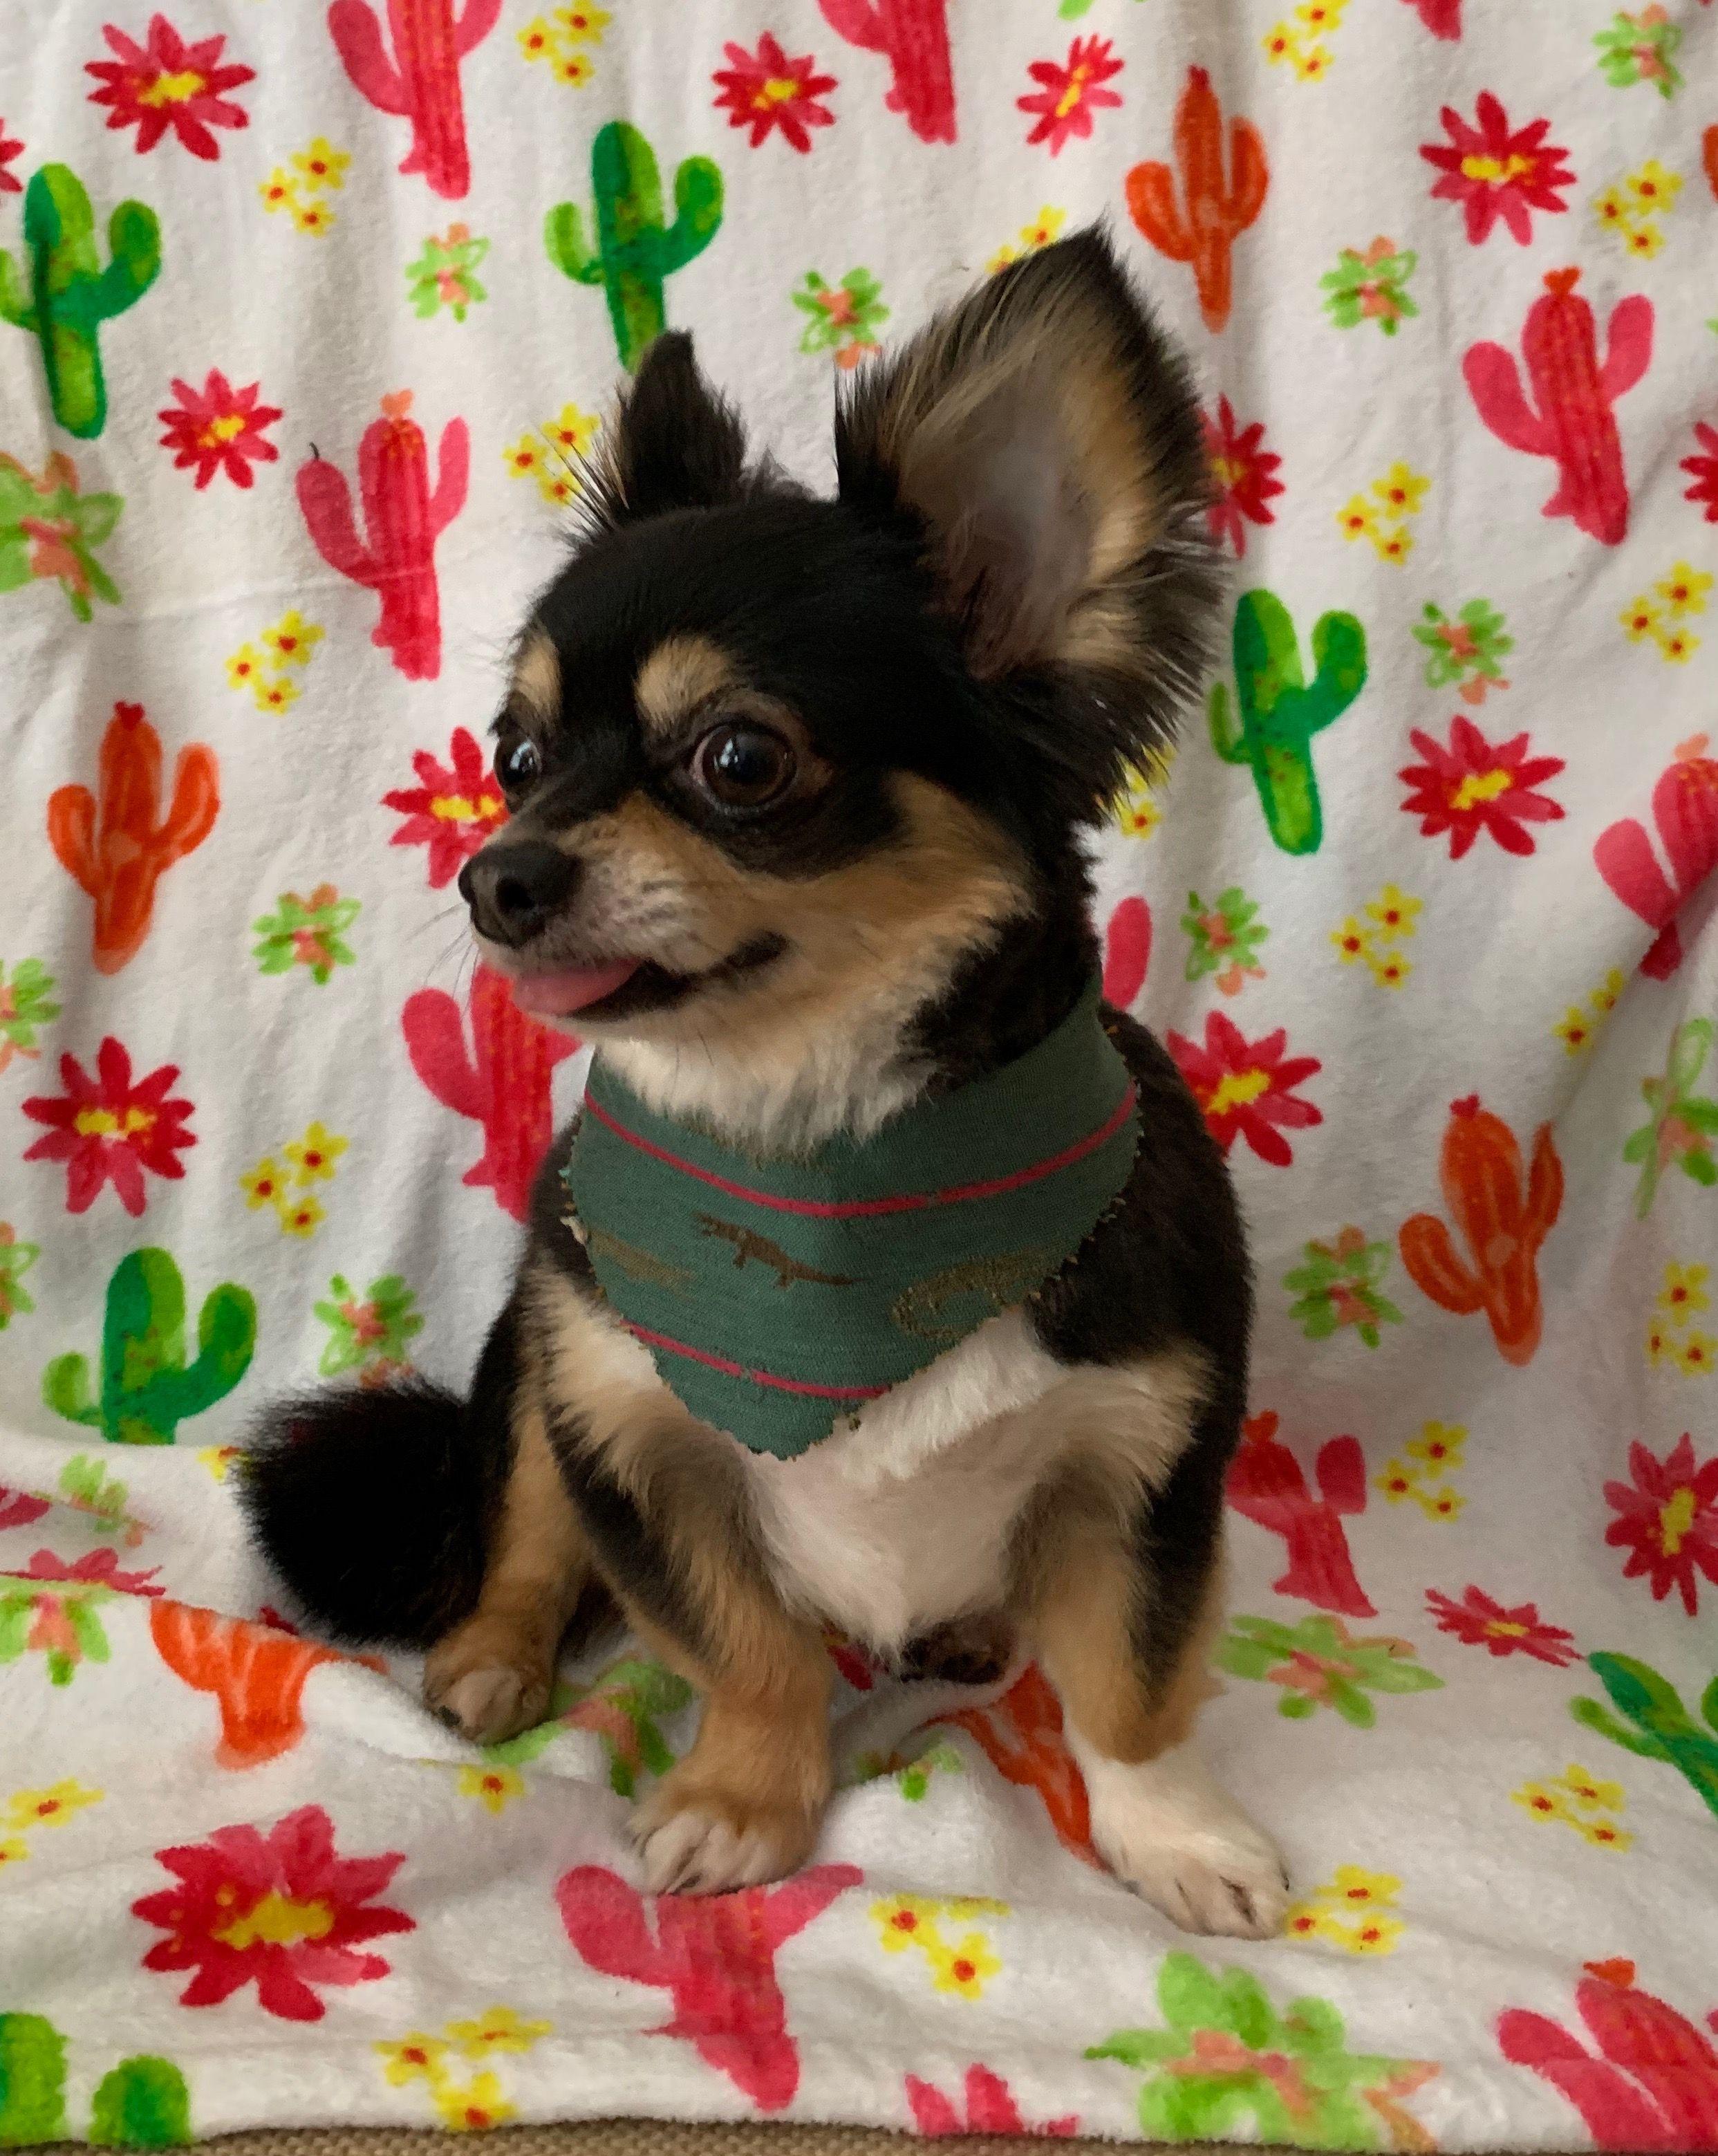 Pin By Kimberly Stamey On Bear My Chihuahua Cute Animals Chihuahua Dogs Chihuahua